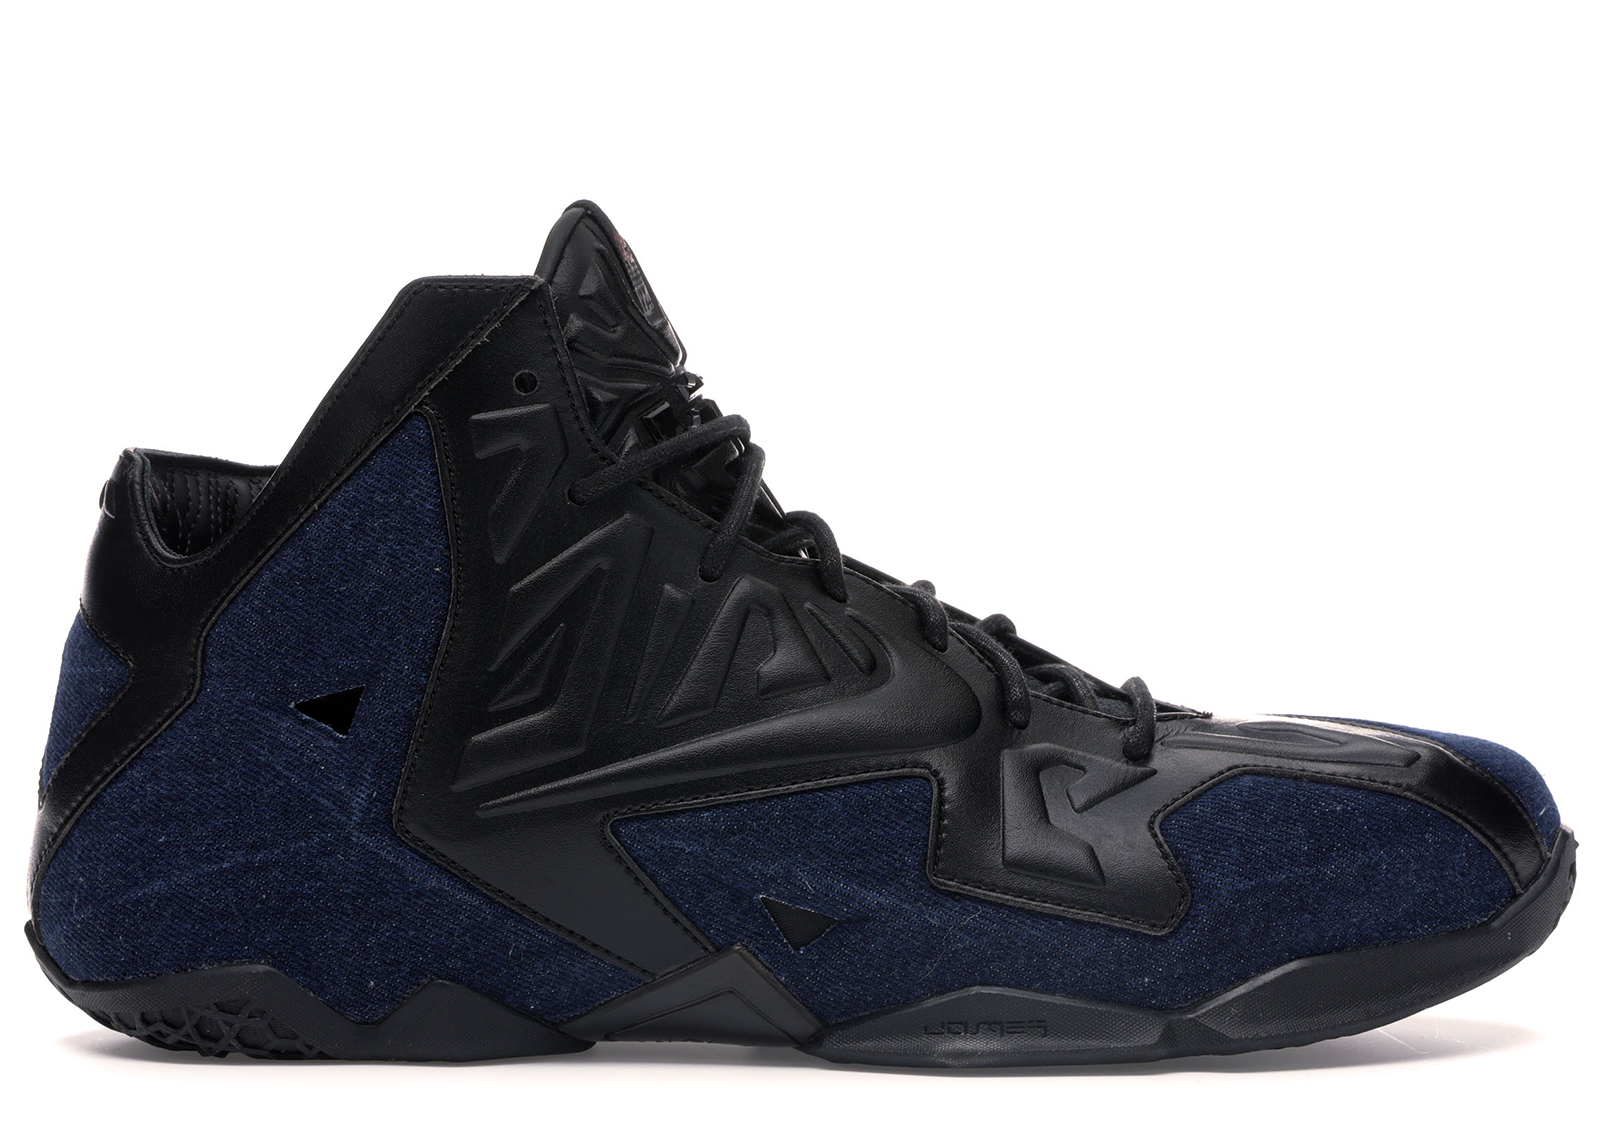 Nike LeBron 11 EXT Denim - 659509-004